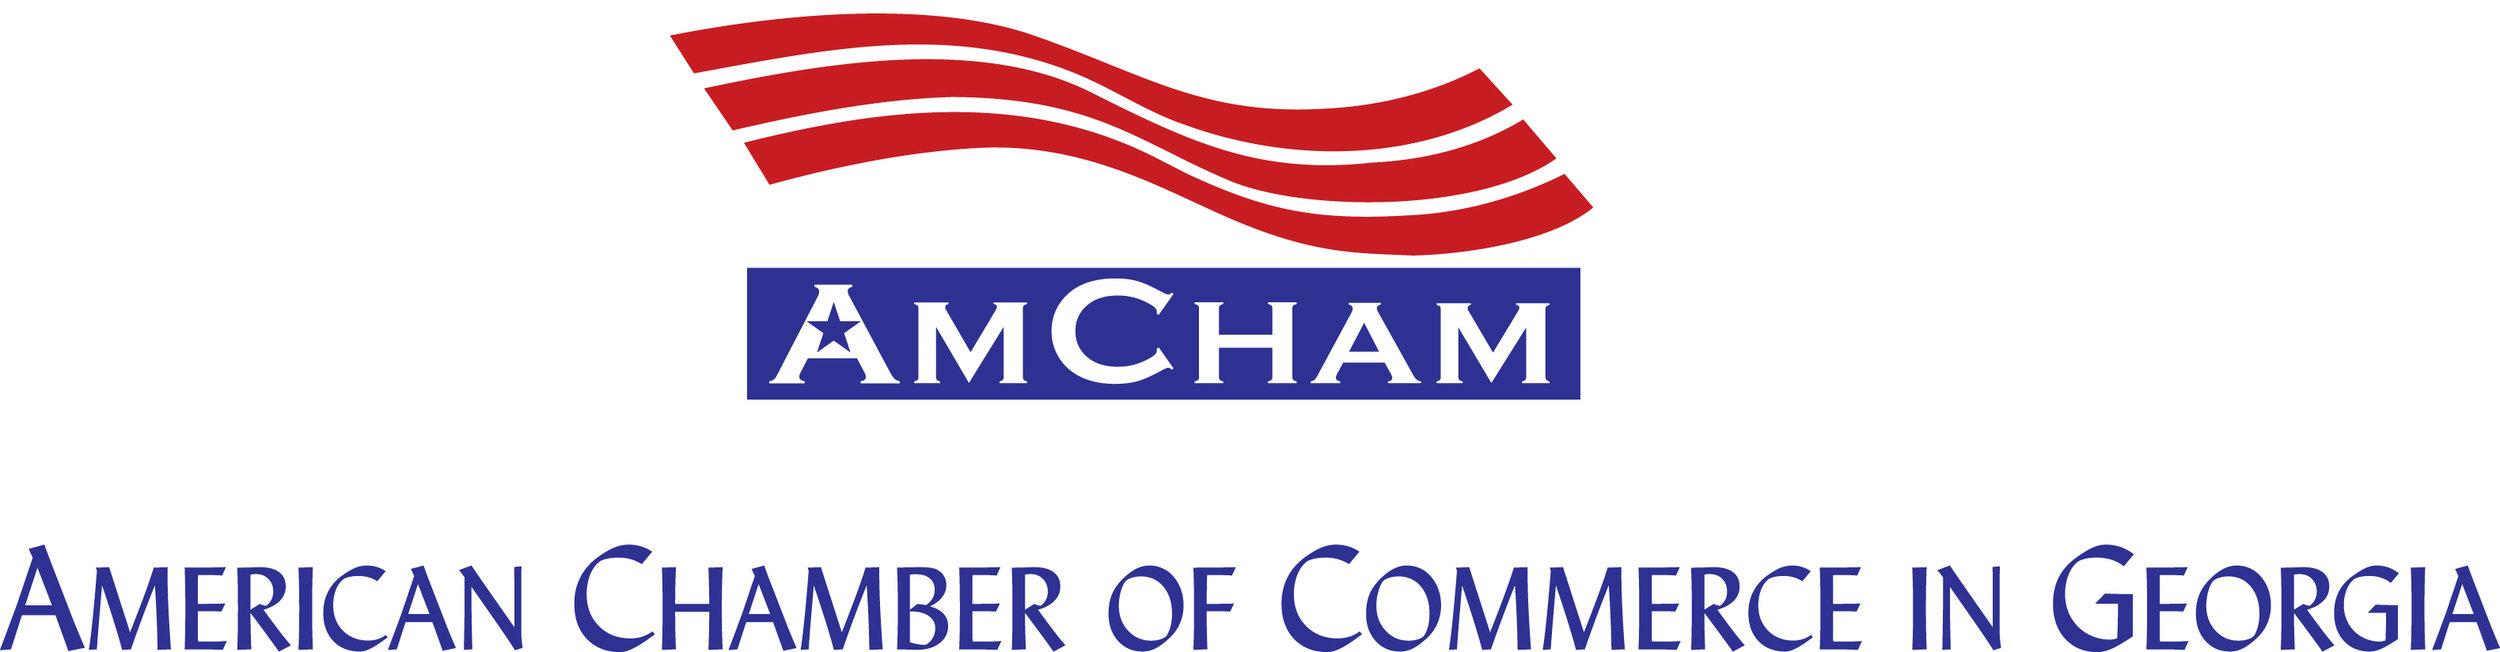 Amcham Logo 2019.jpg